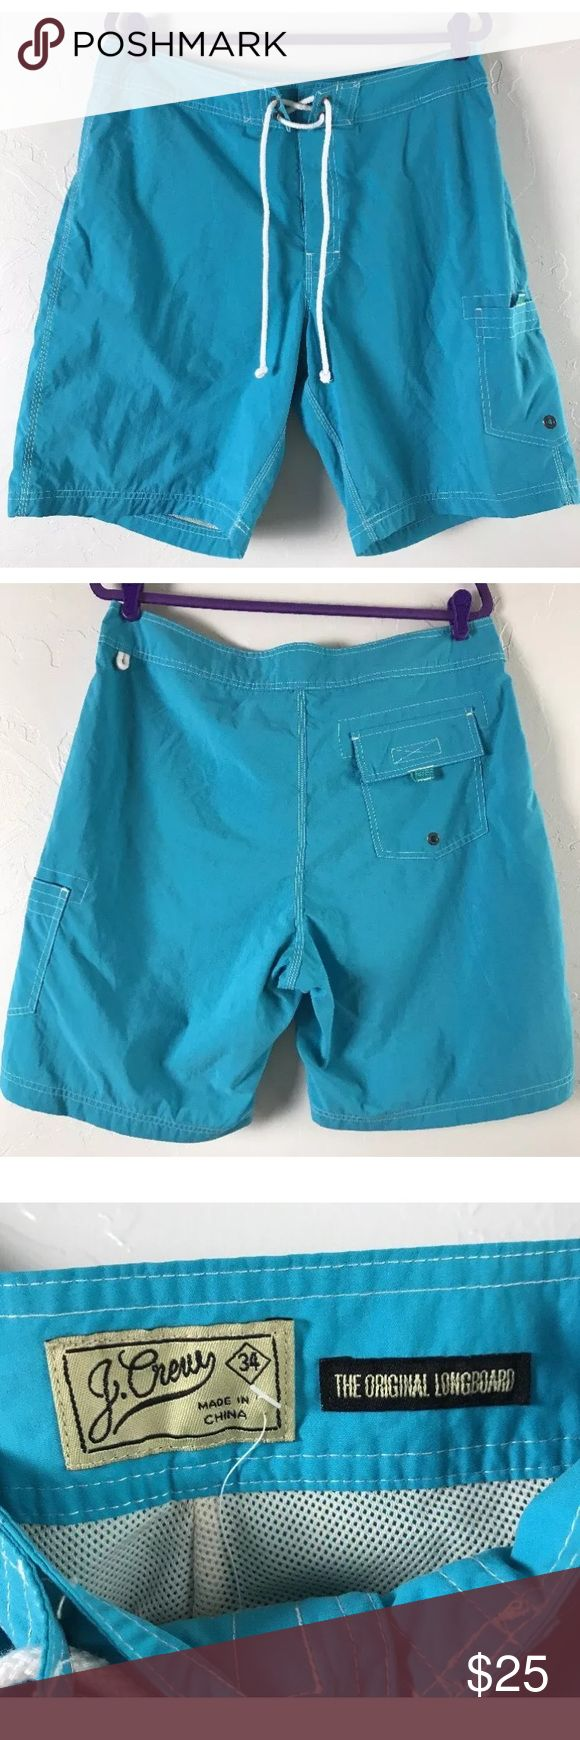 "J.Crew Mens Long Board Swim Trunks Sz 34 W/ Mesh J Crew the Original Longboard Shorts Waist 34"" Inseam 8 1/2"" Length 21 1/2"" Color Blue Made in China J. Crew Shorts"